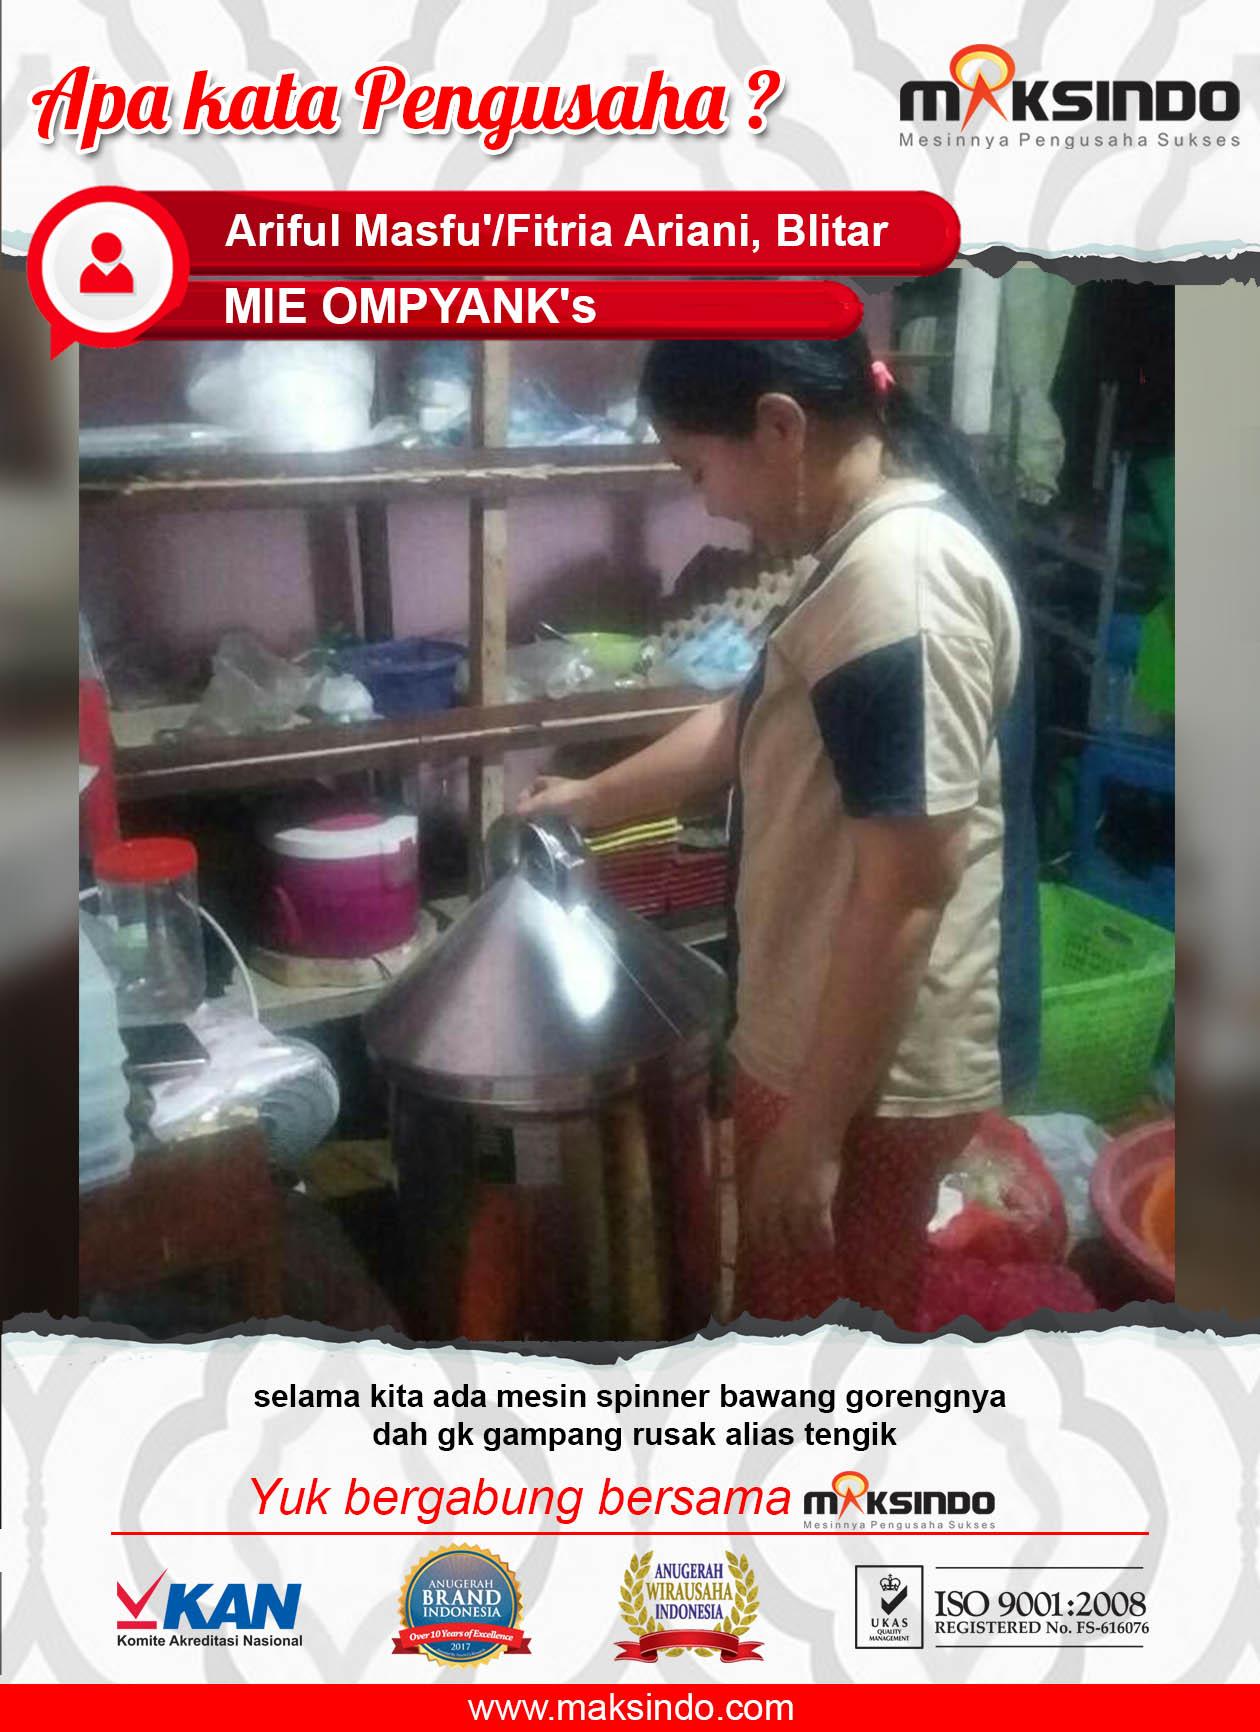 MIE OMPYANK's : Menggoreng Bawang Tidak Tengik atau Rusak dengan Spinner Maksindo